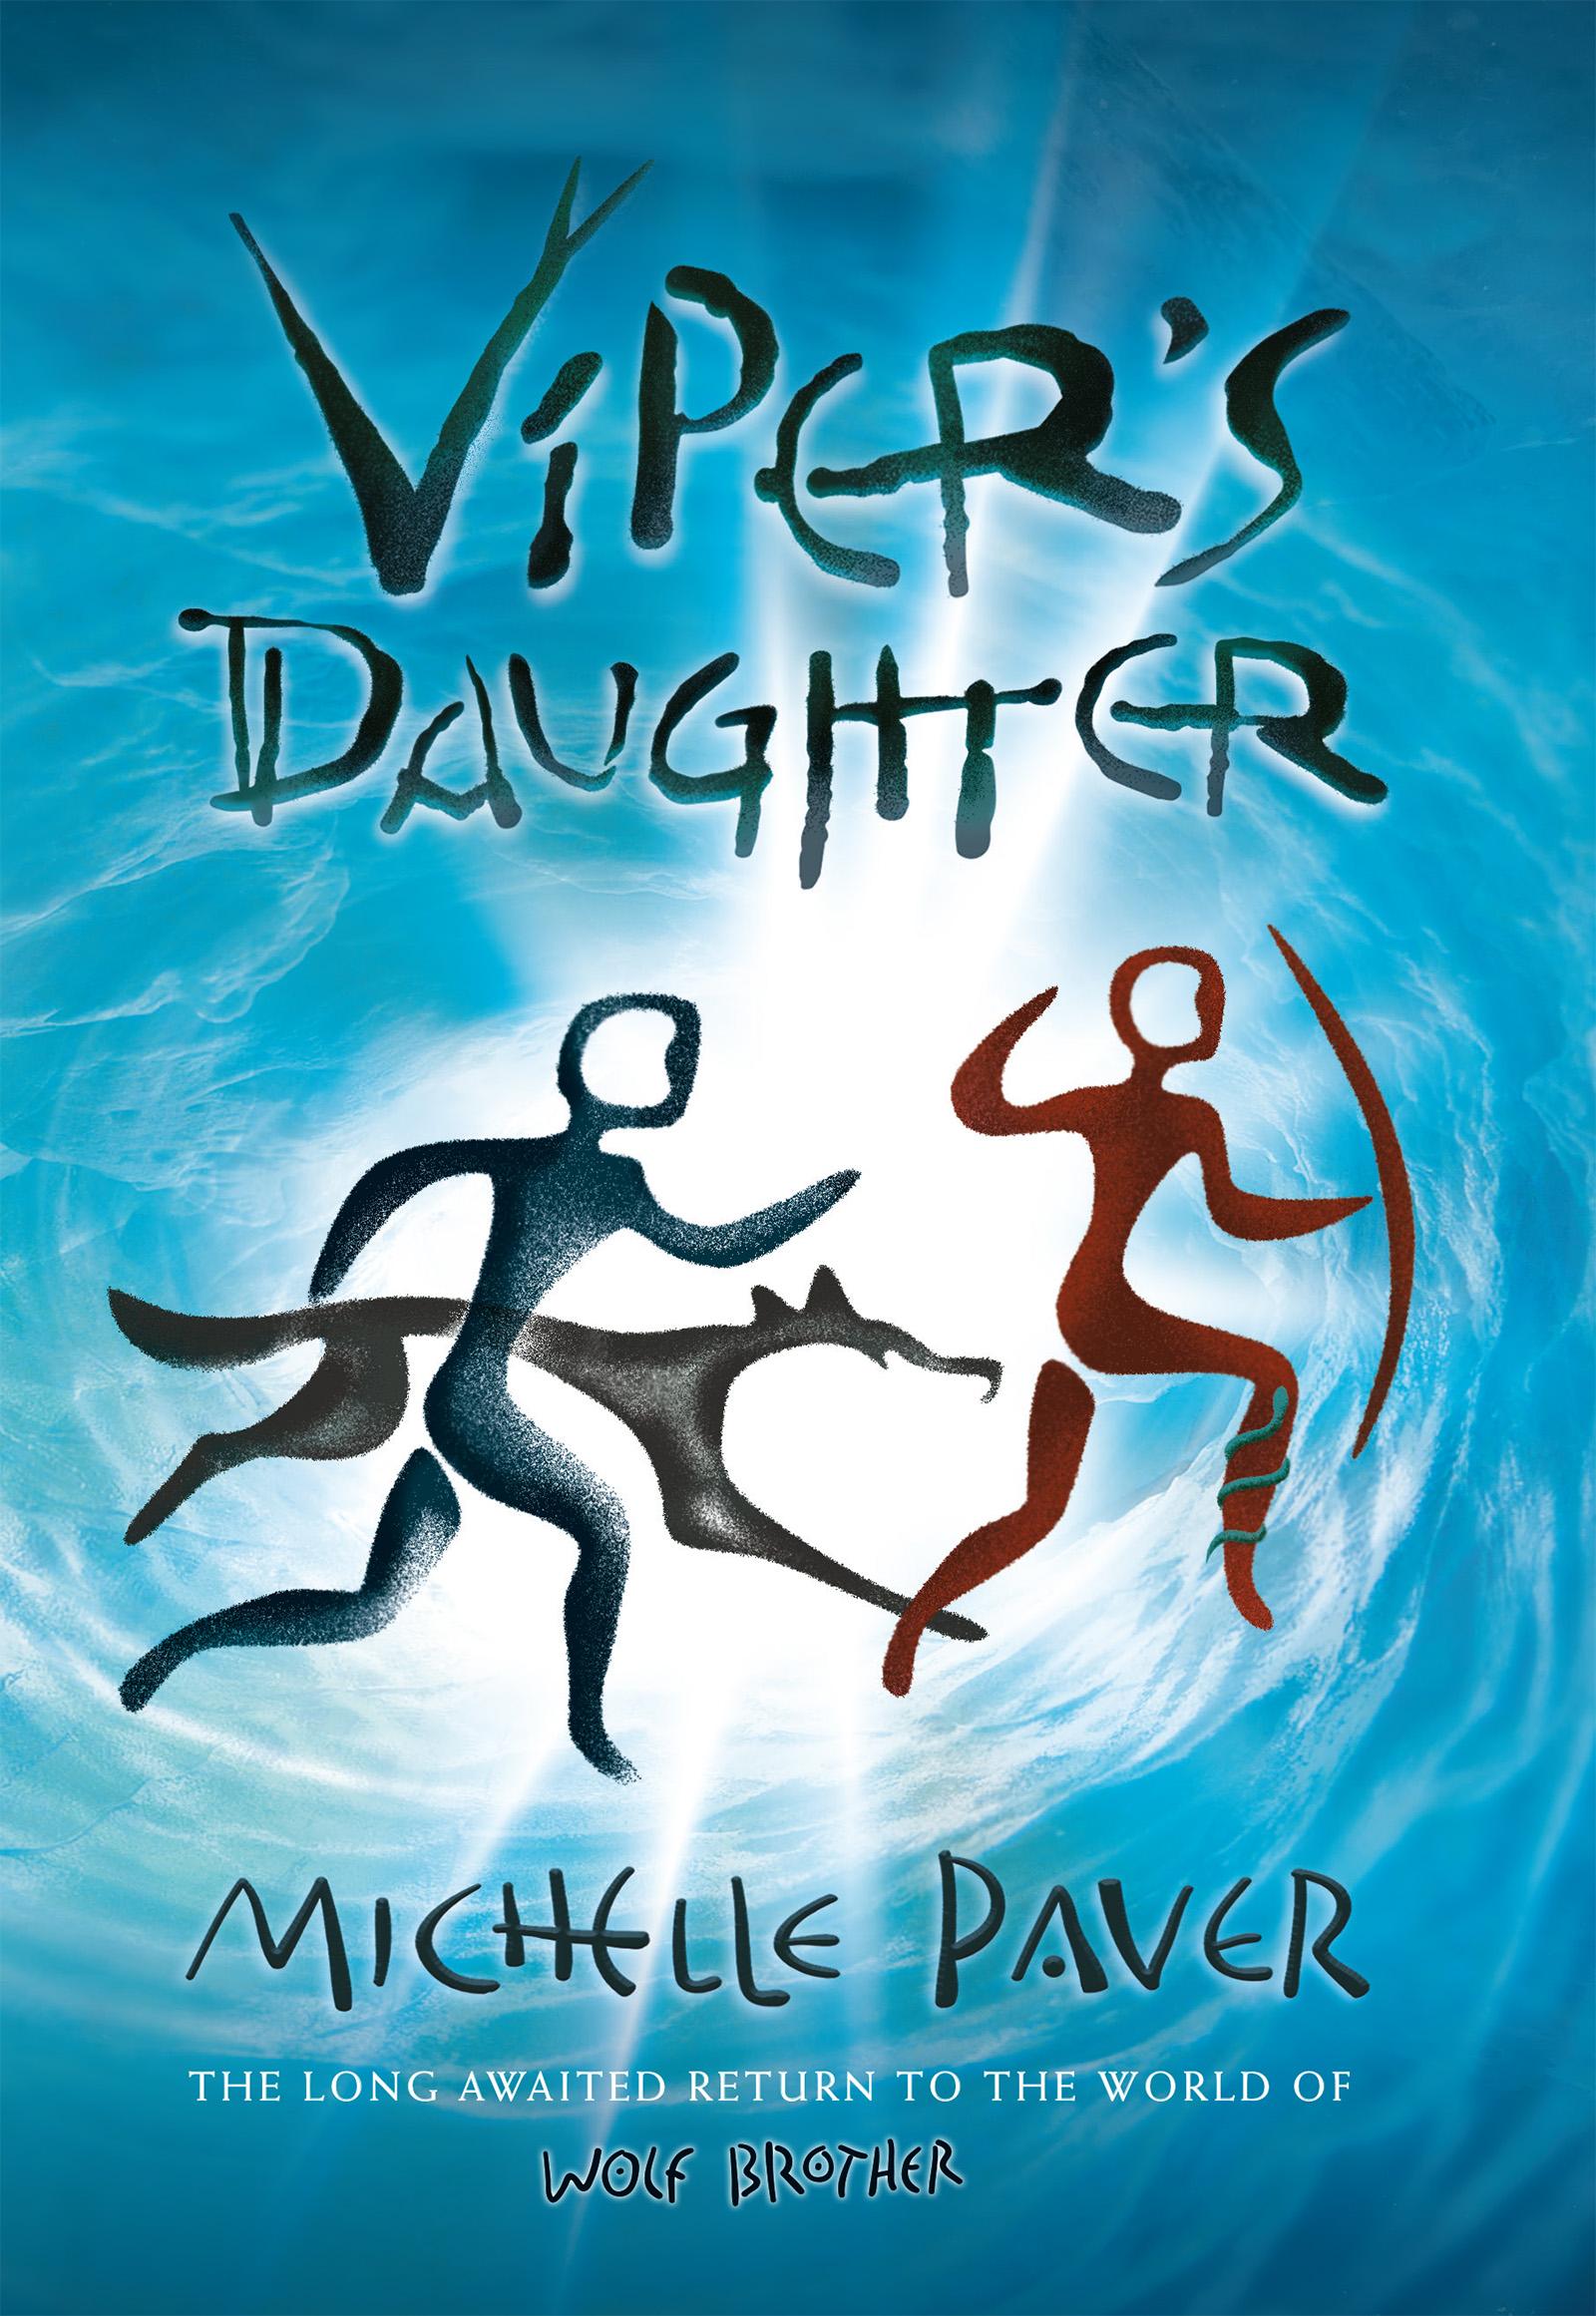 Viper's Daughter copy